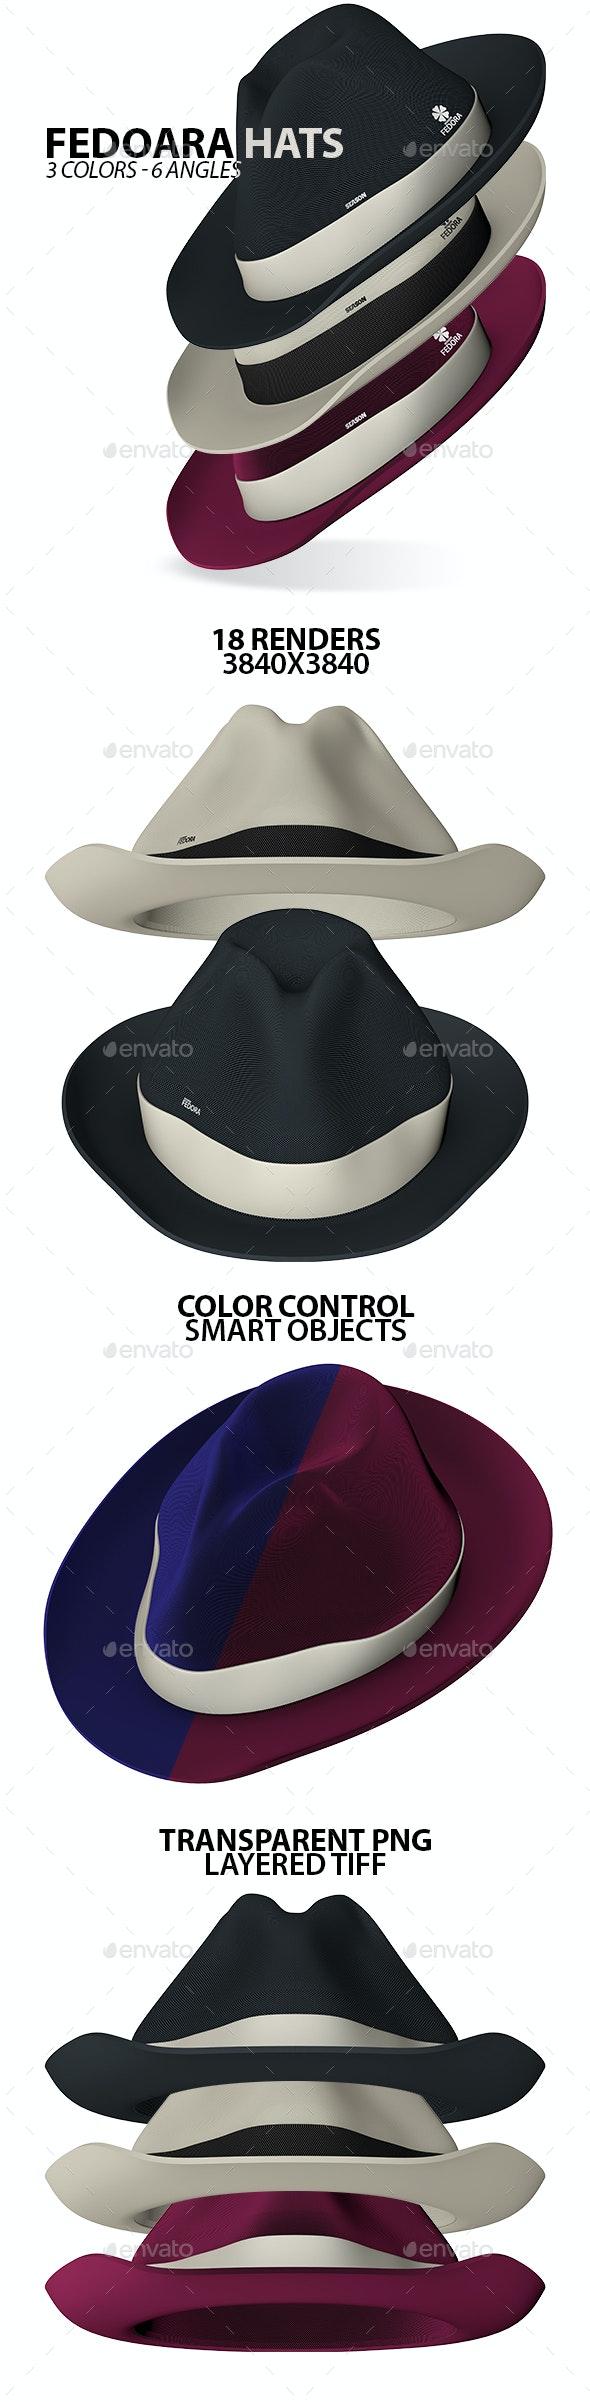 Fedora Hats - Objects 3D Renders